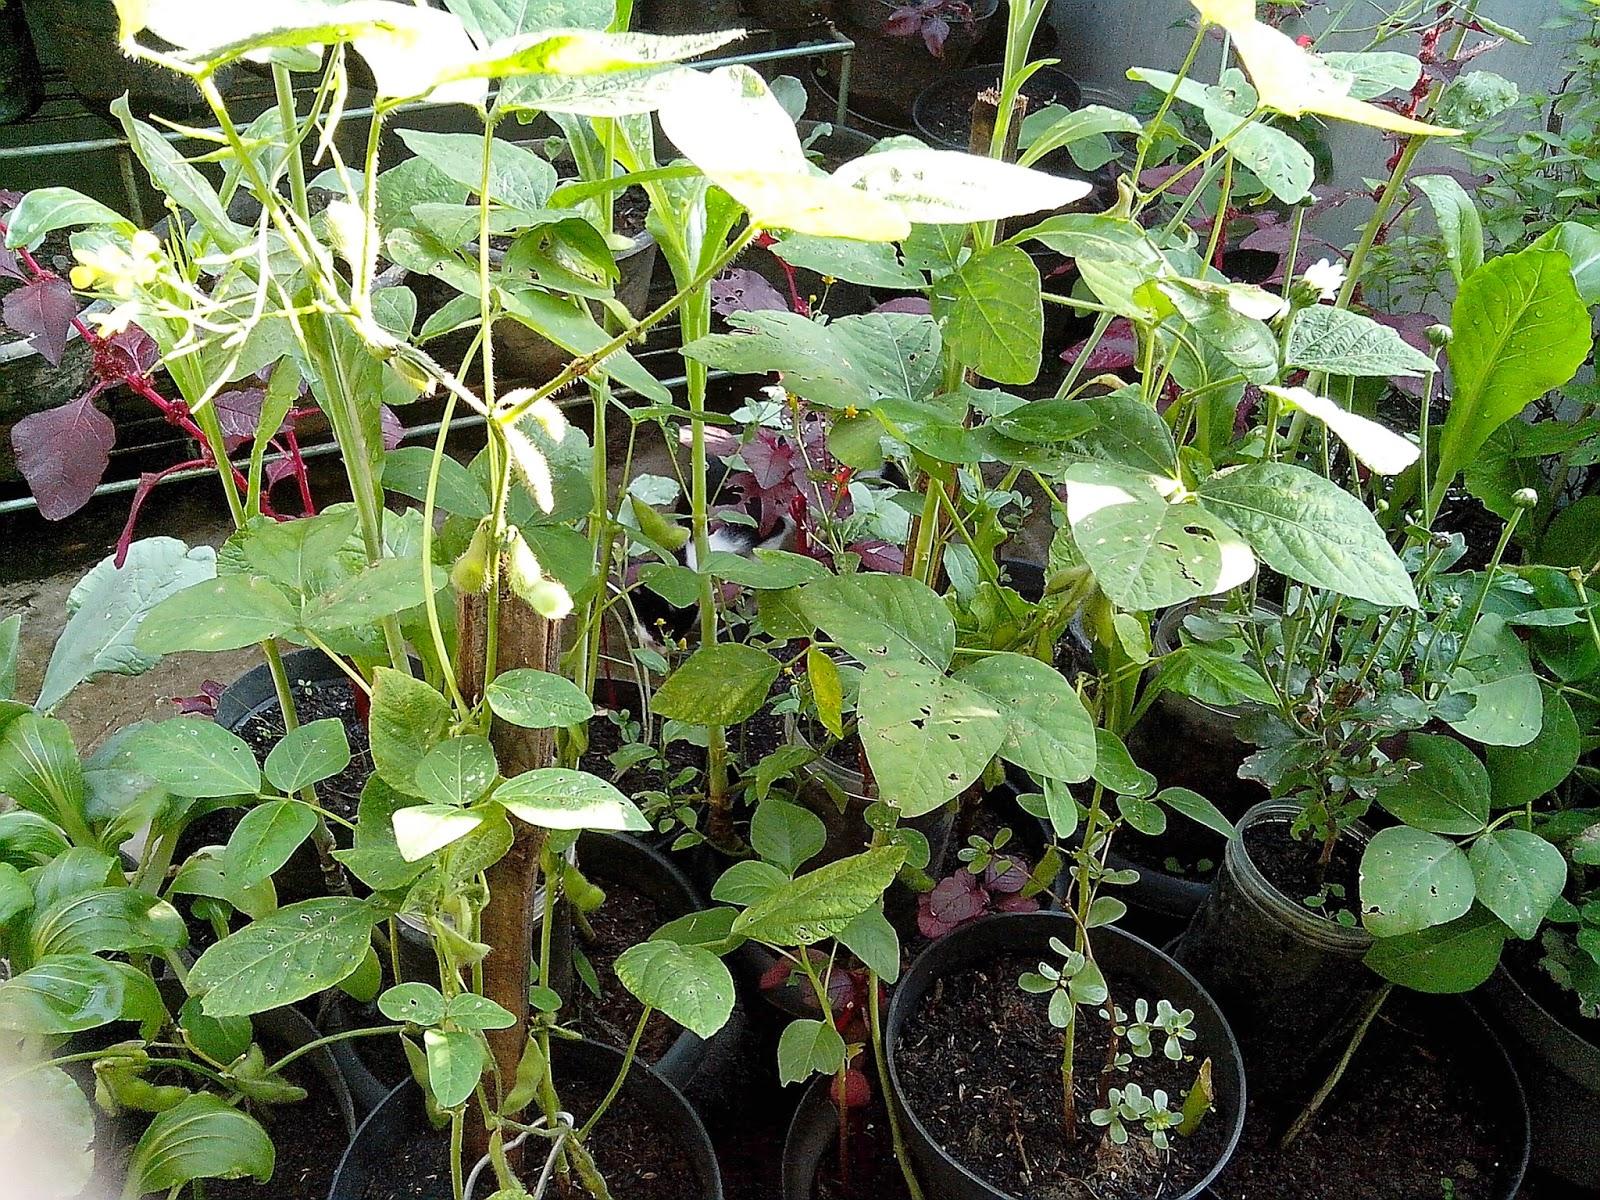 Urban Farming for Food: Beans: Edamame/Soy Beans (毛豆) |Edamame Flower